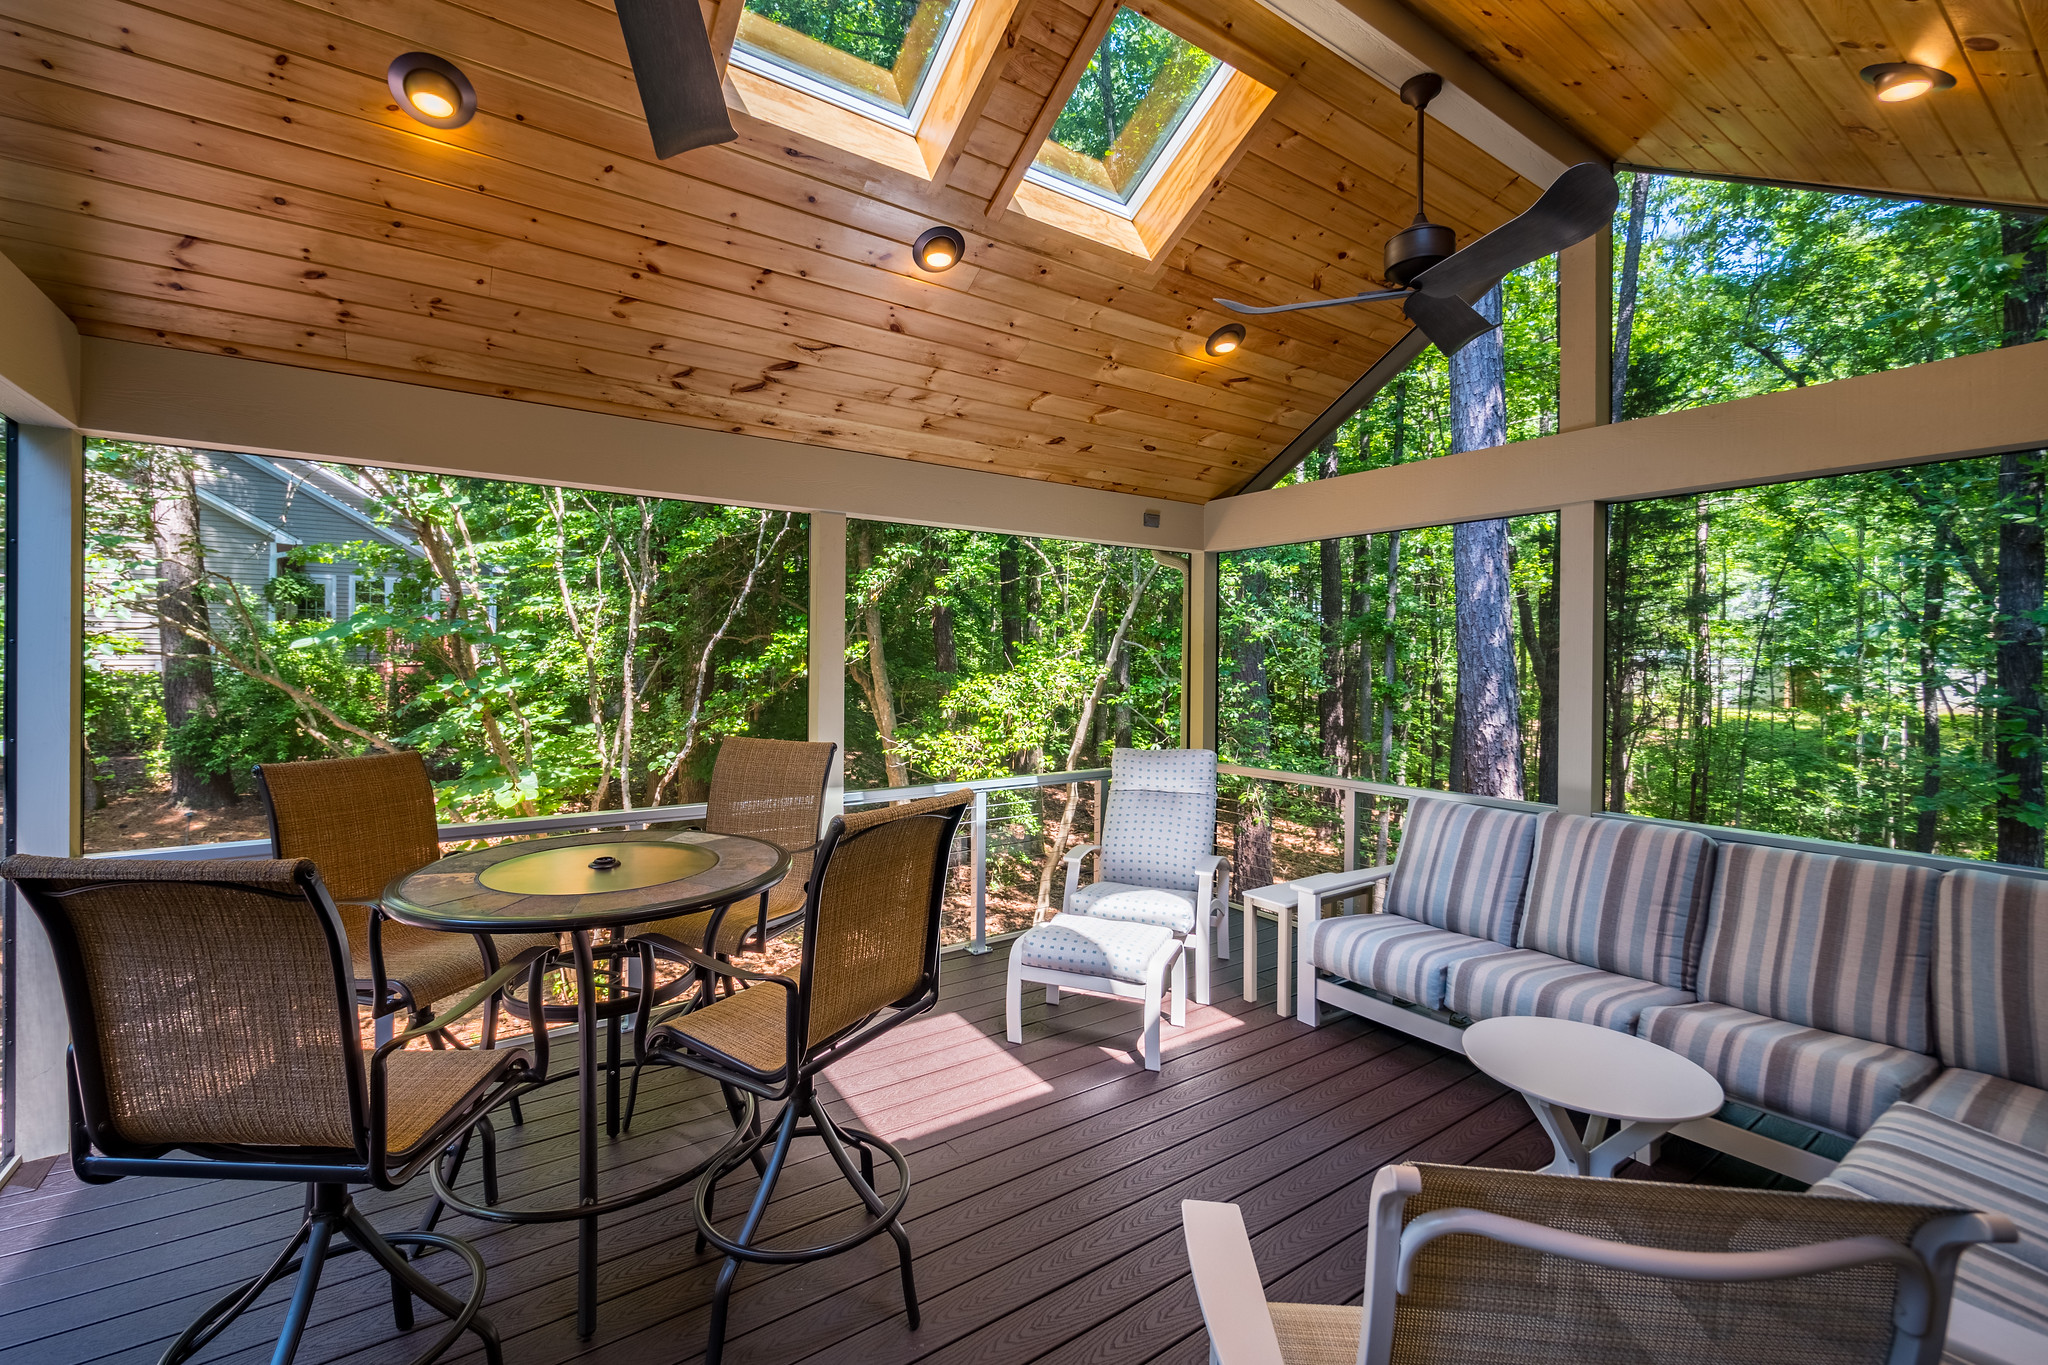 Screen Porch Addition - Image 6